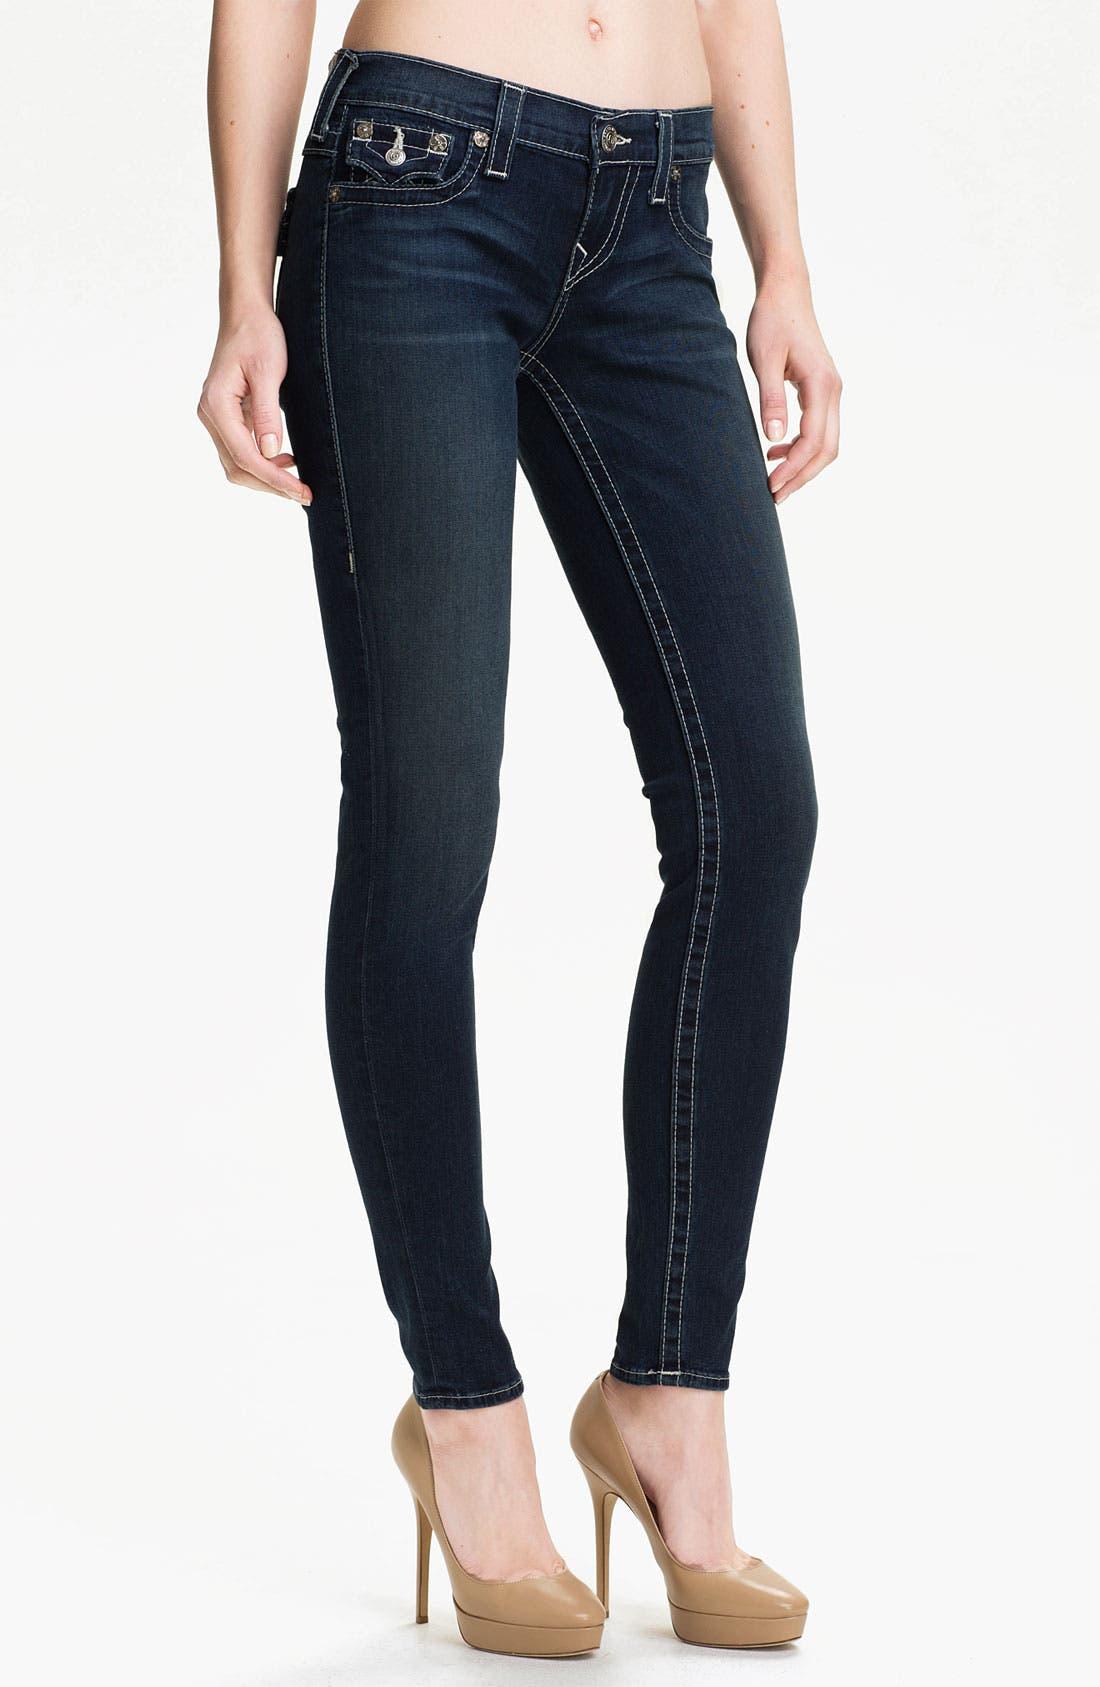 Main Image - True Religion Brand Jeans 'Misty' Skinny Leg Jeans (Buckeye)